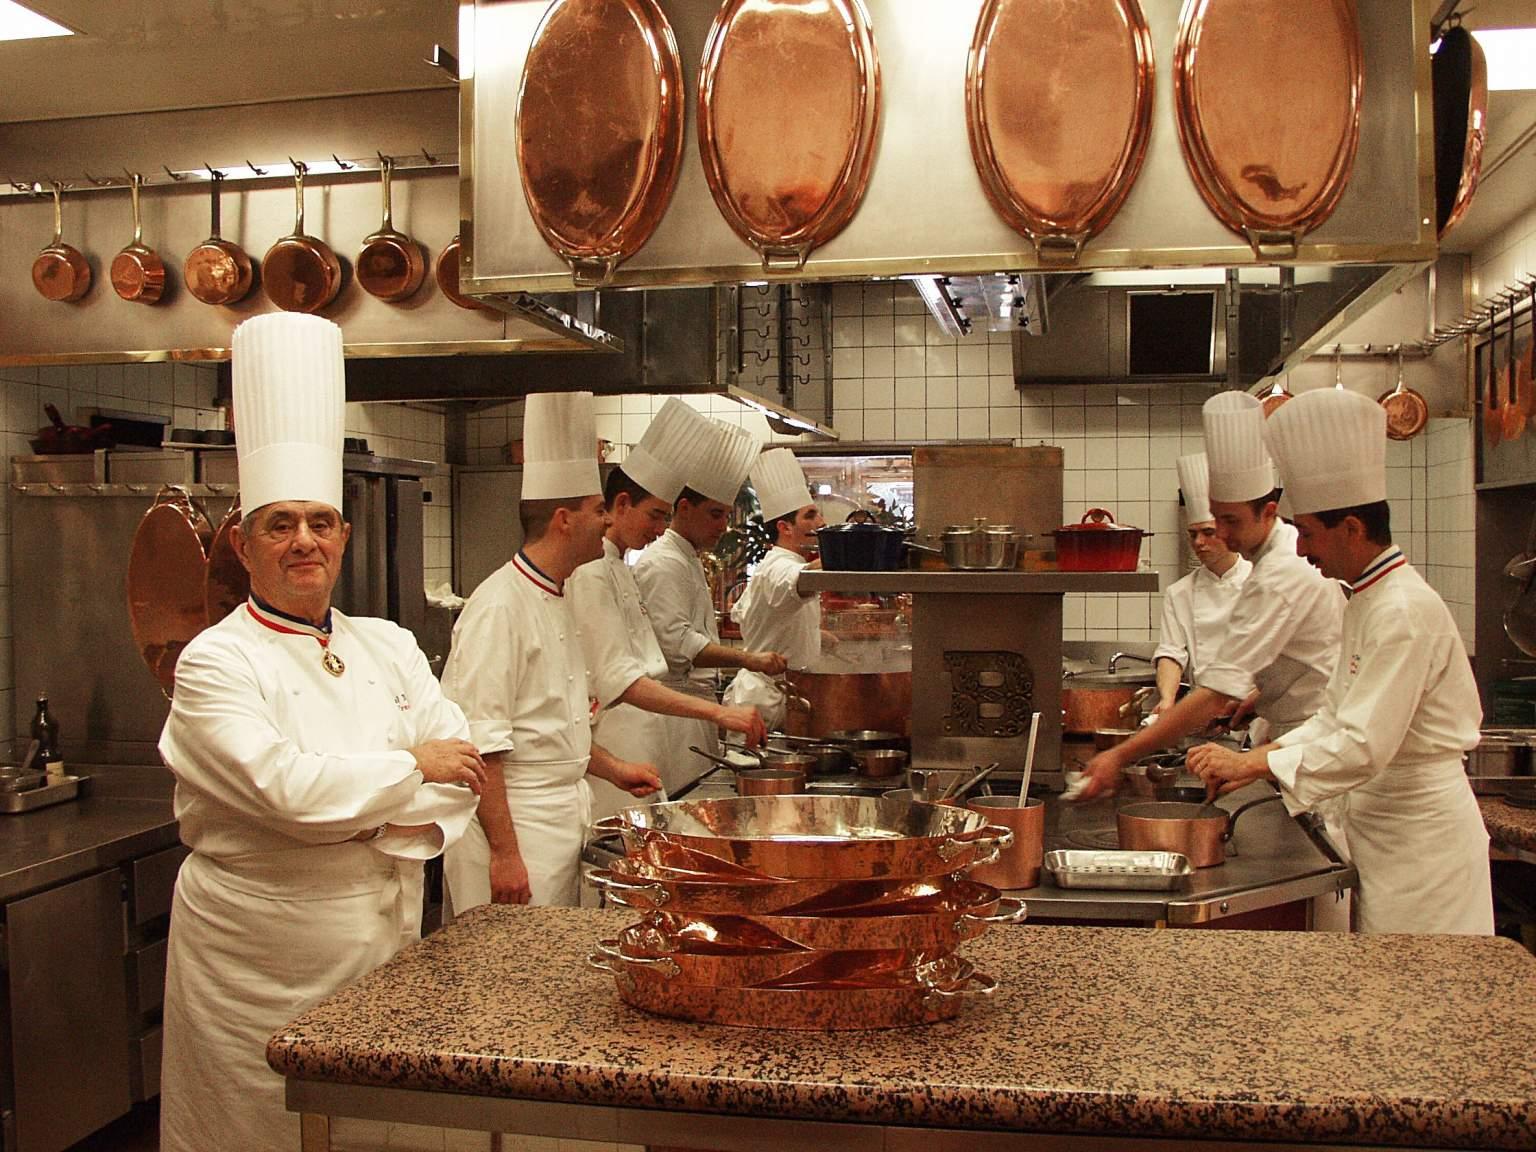 bocuse-cuisine-plats-ov